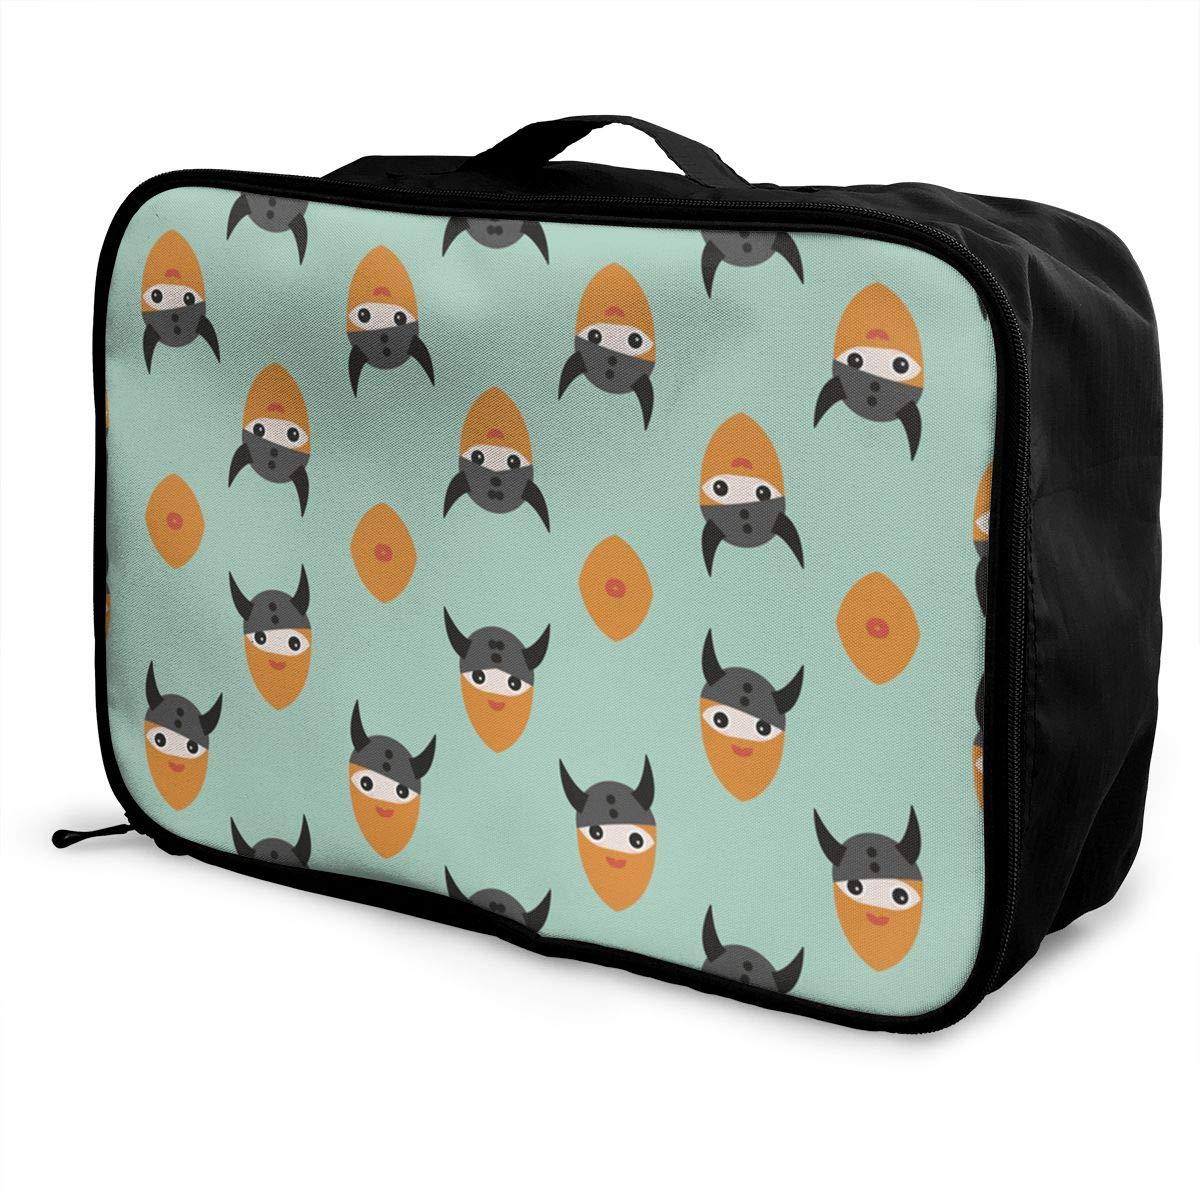 Travel Duffel Bag Waterproof Fashion Lightweight Large Capacity Portable Luggage Bag Scandinavian Nordic Viking